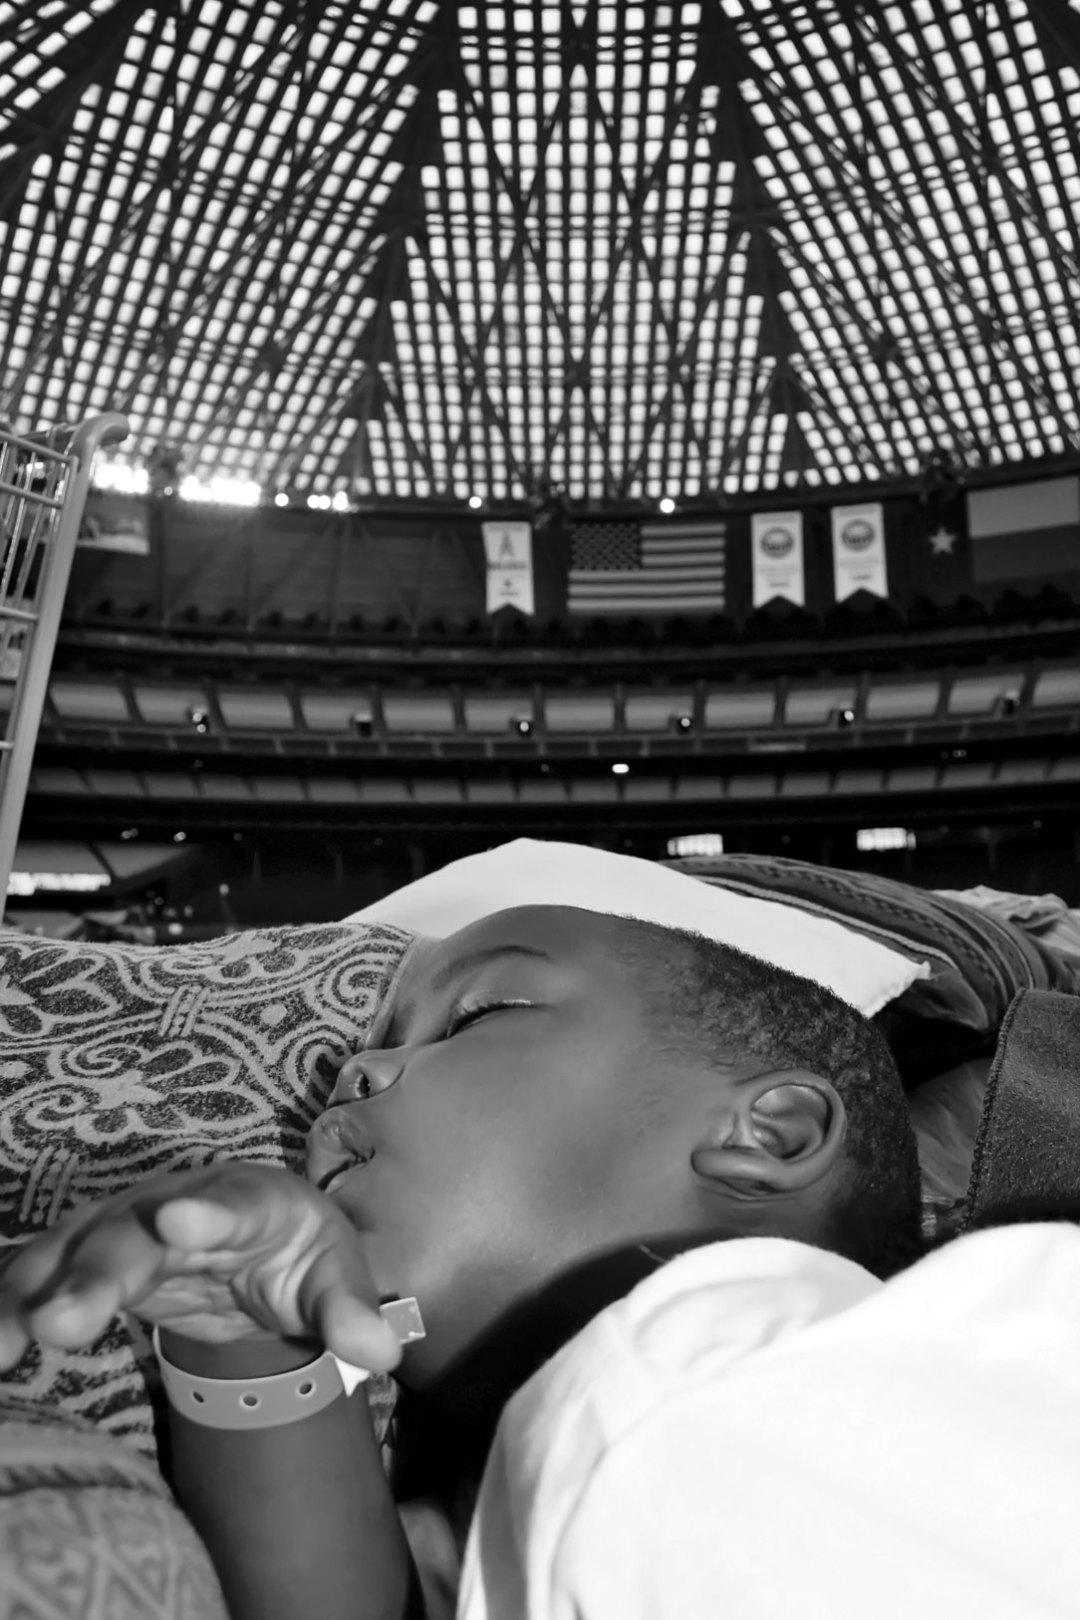 0915 katrina horner child sleeping astrodome qvqj9o